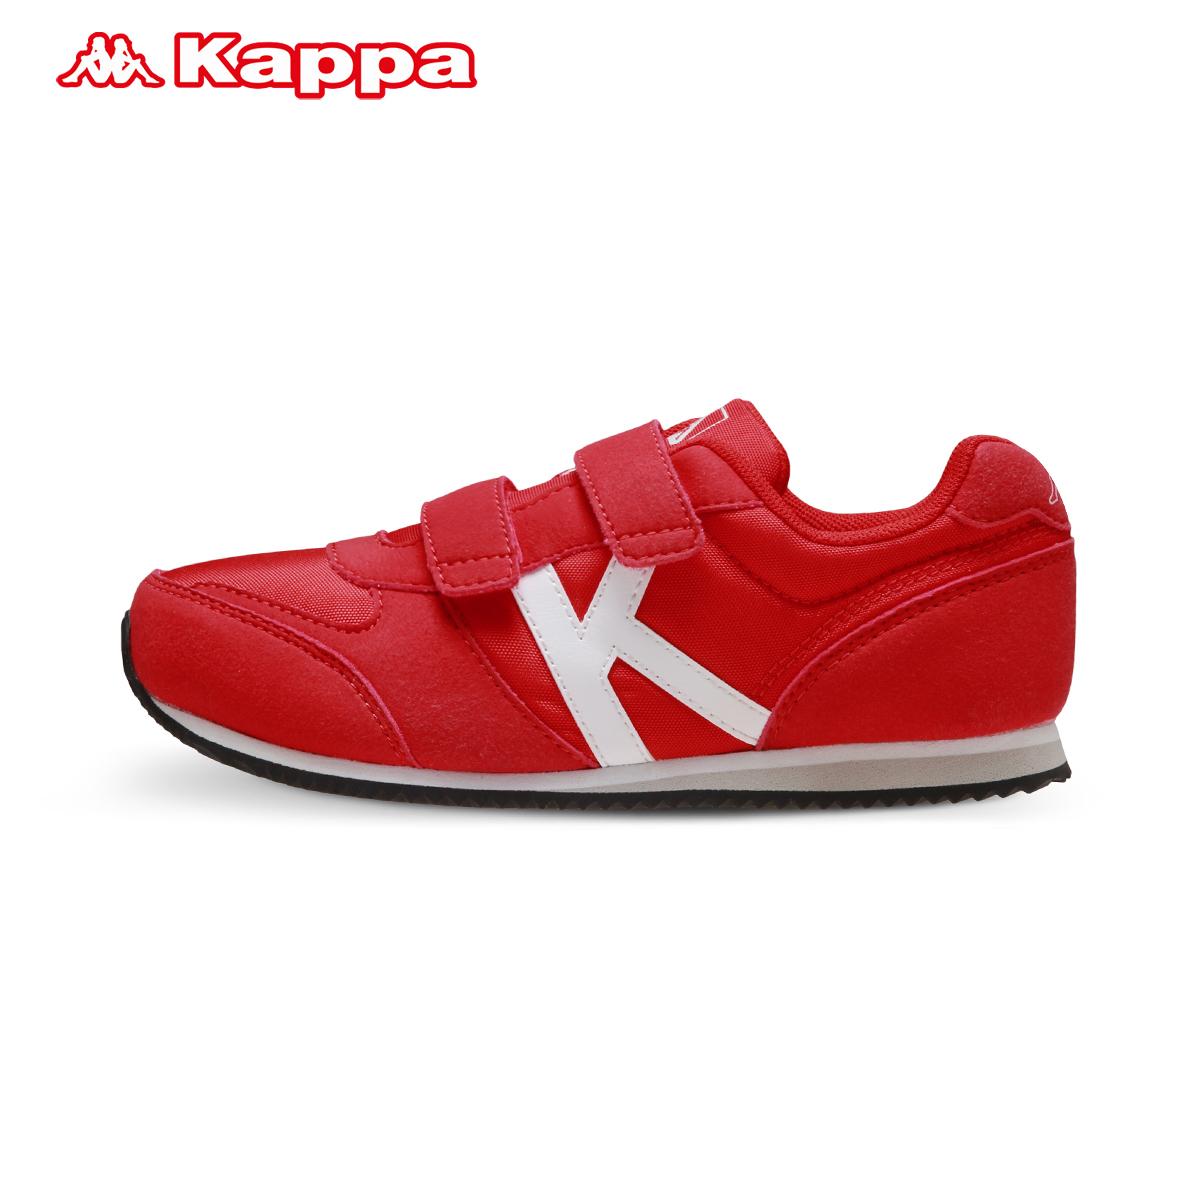 Kappakids童鞋 男女兒童魔術貼 鞋複古跑鞋潮鞋K05Y5MM06